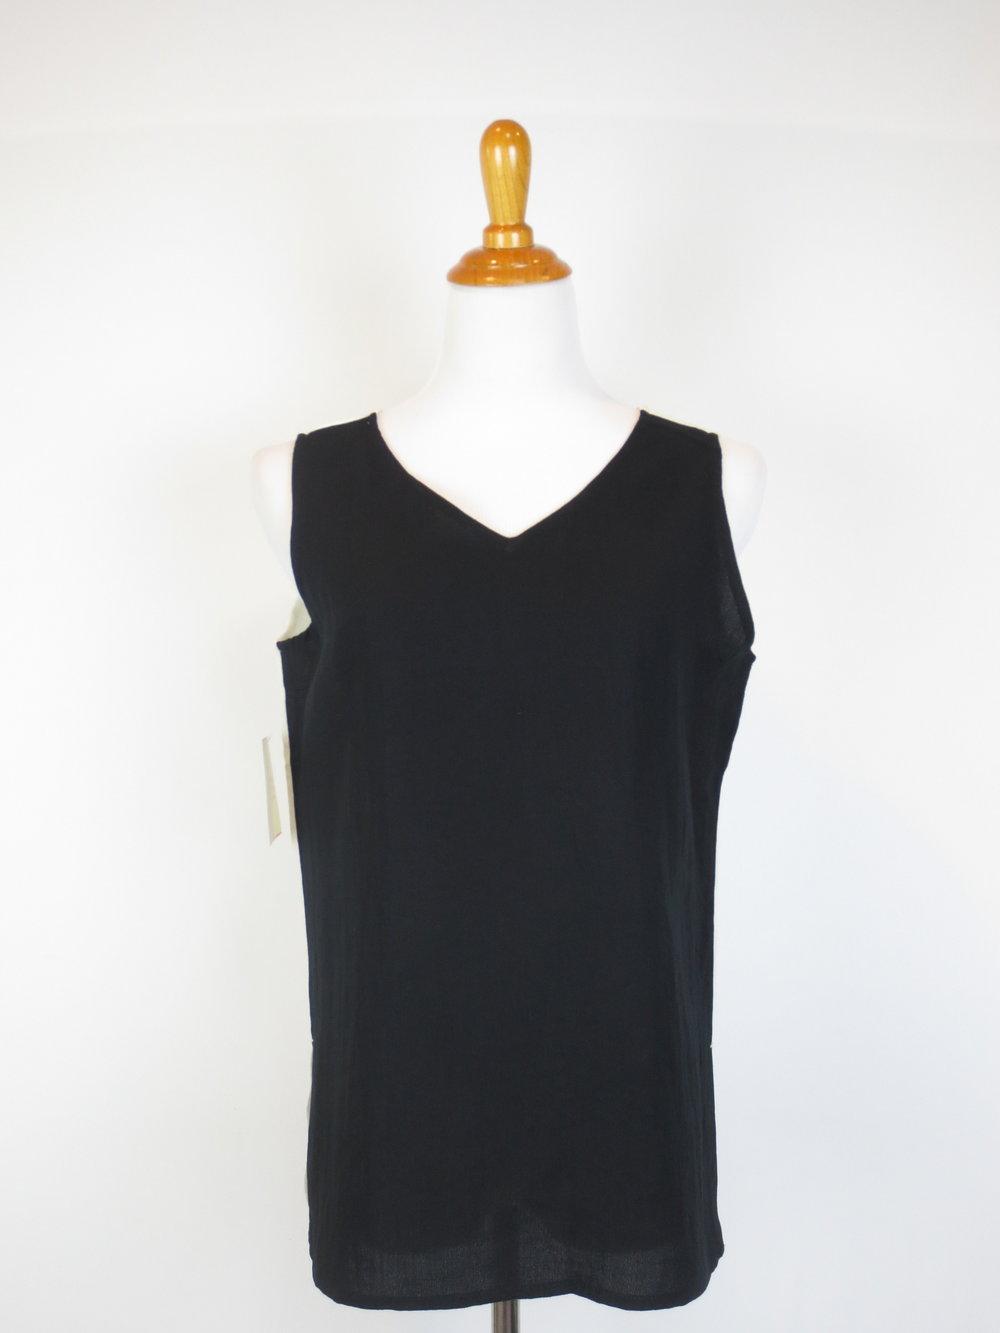 AATK08- Black-White (1).JPG